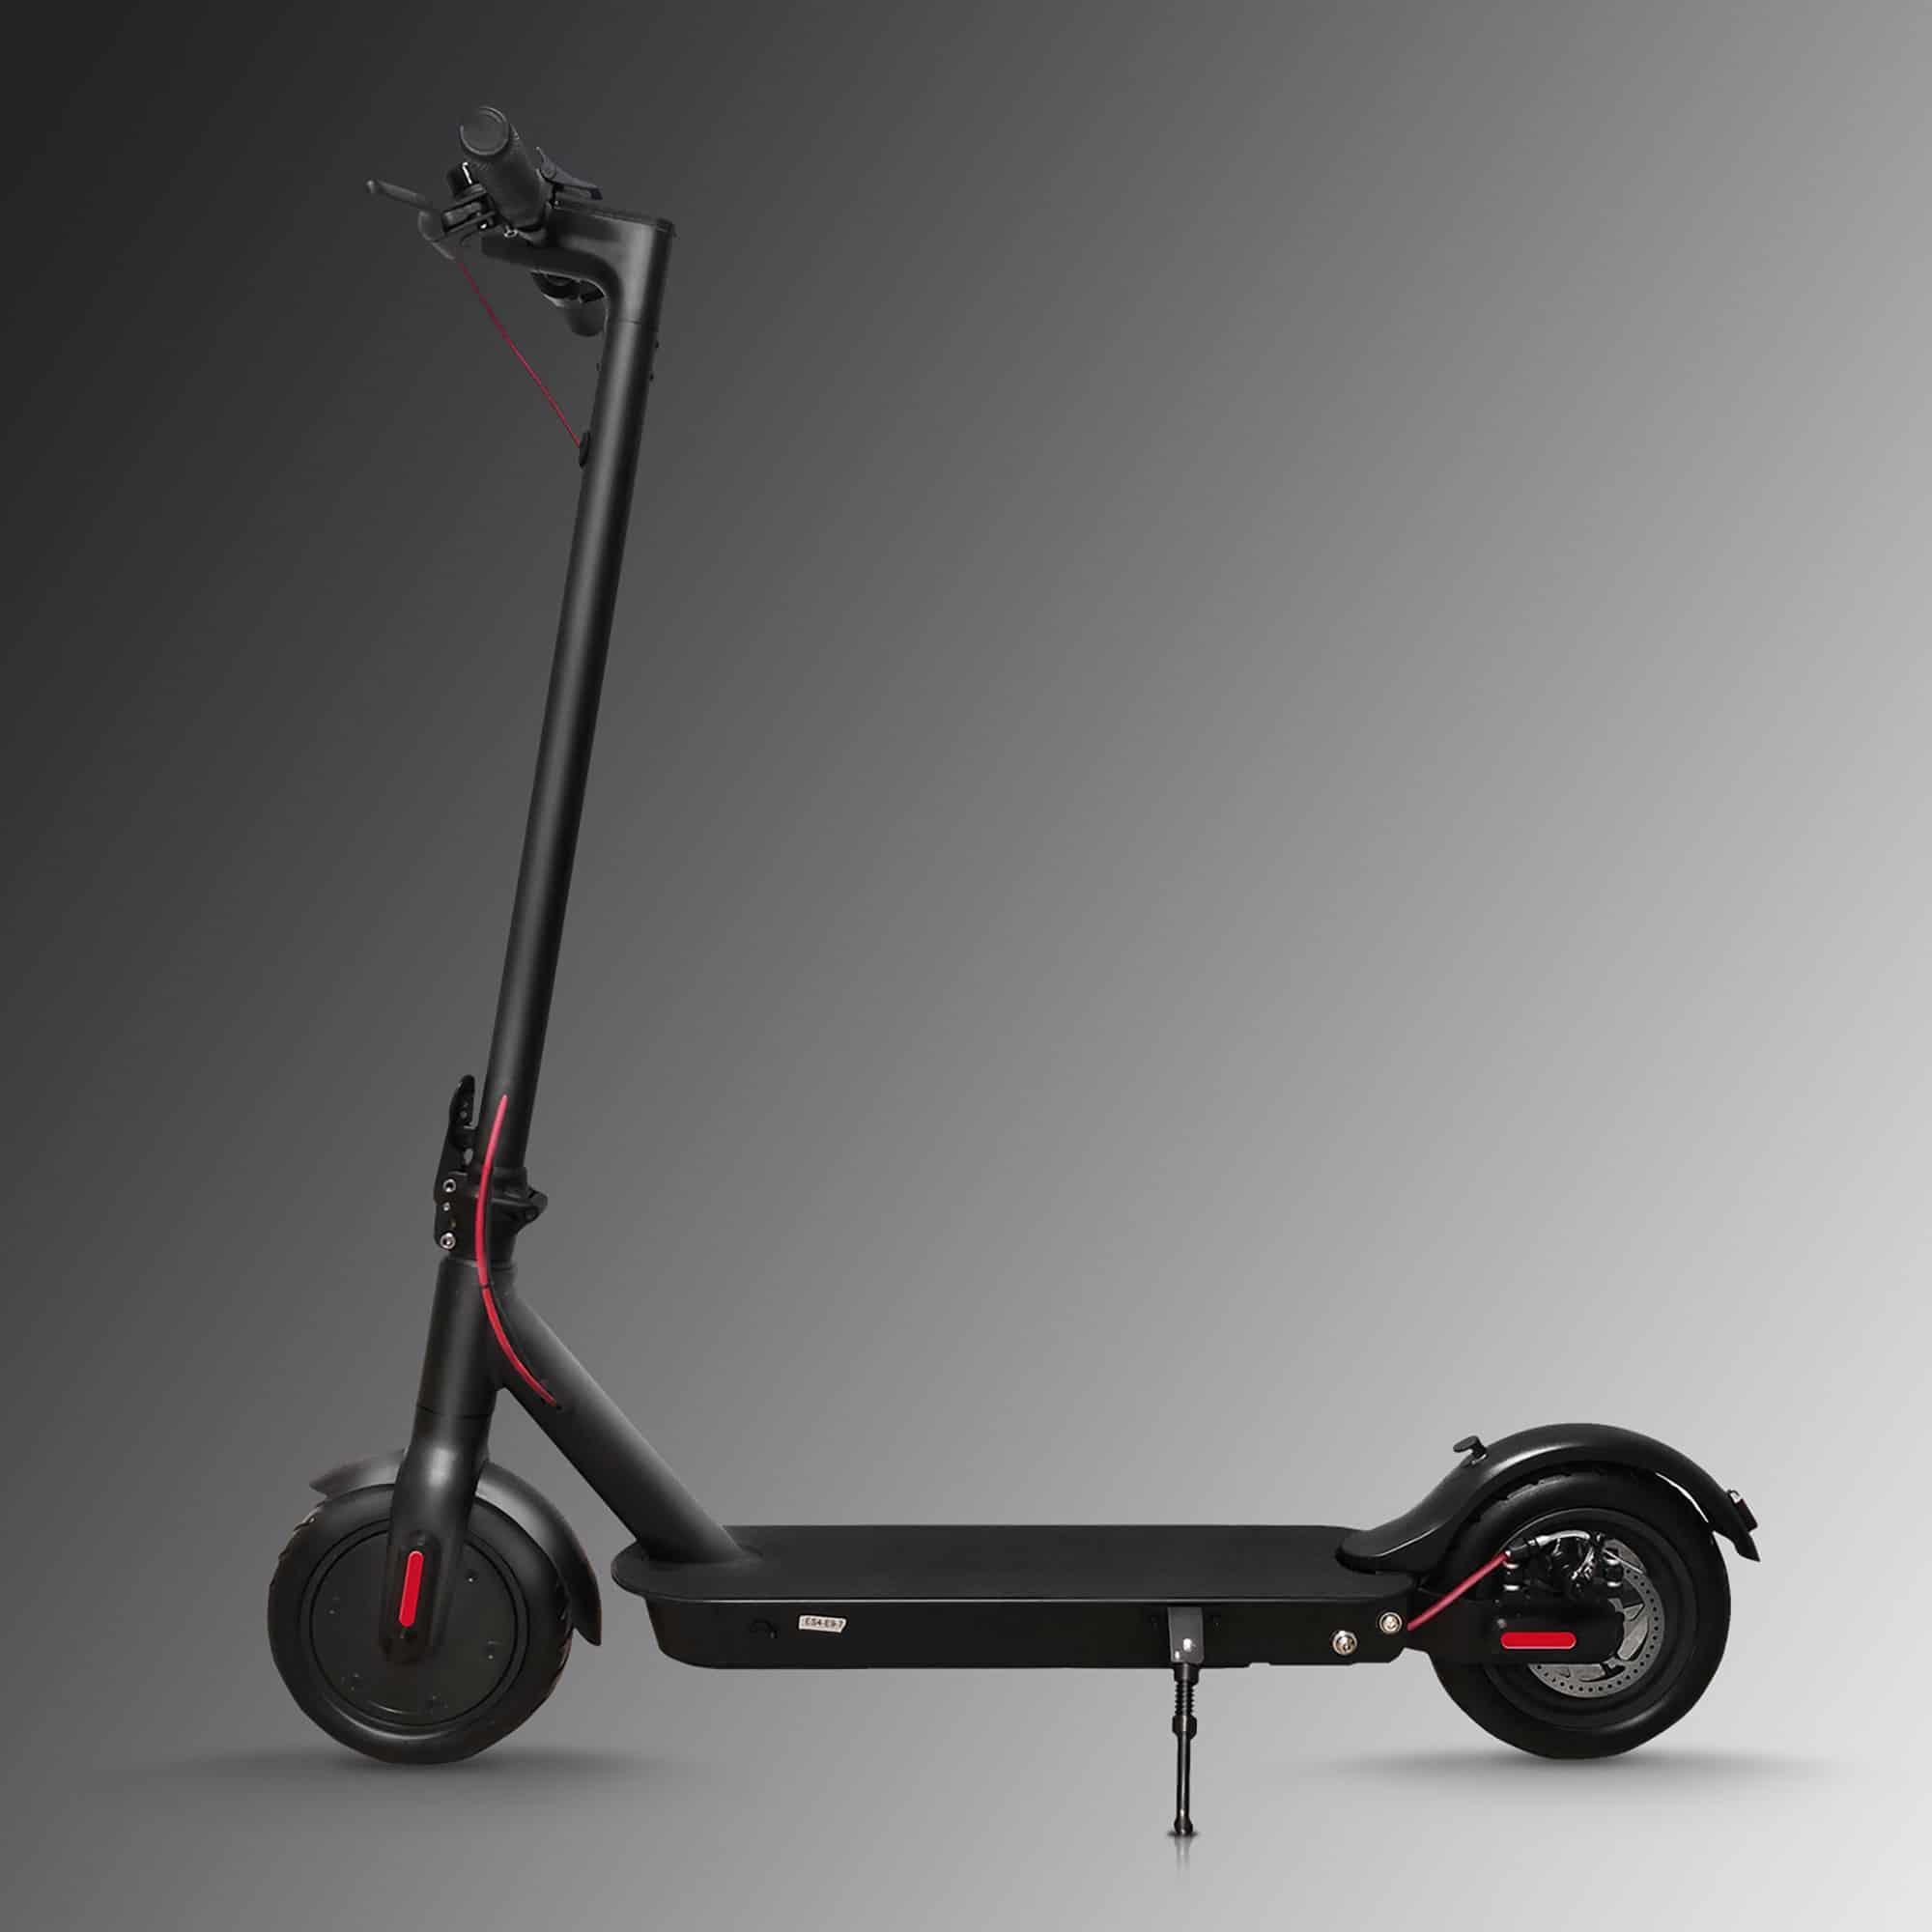 Patinete eléctrico E9 Zlion - Zwheel